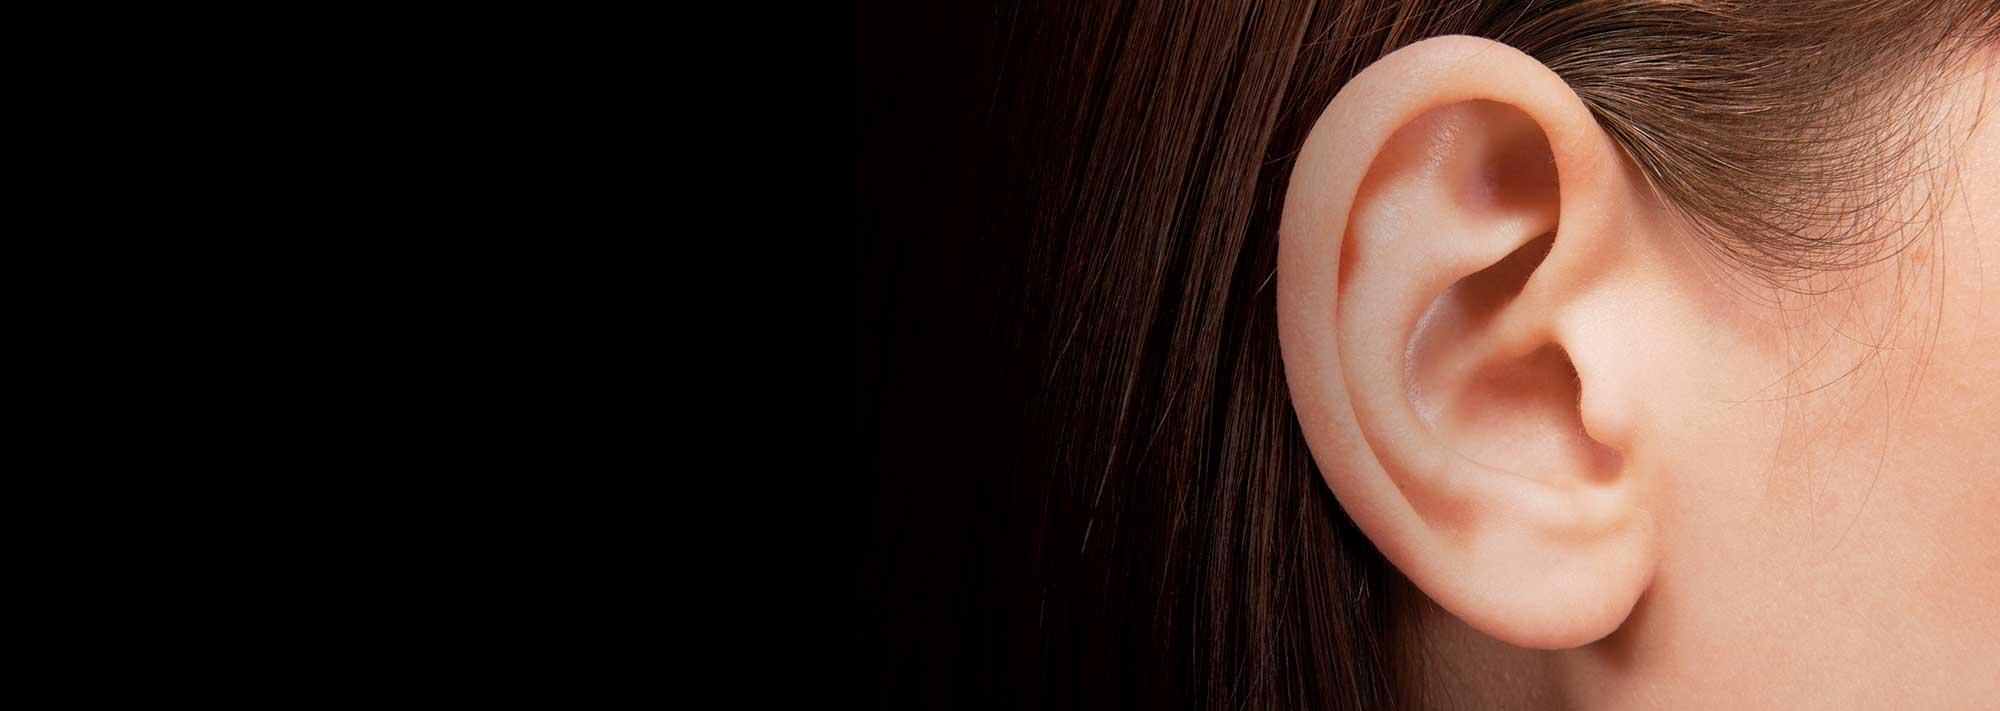 otowel-saude-ouvidos-orelha-mulher.jpg